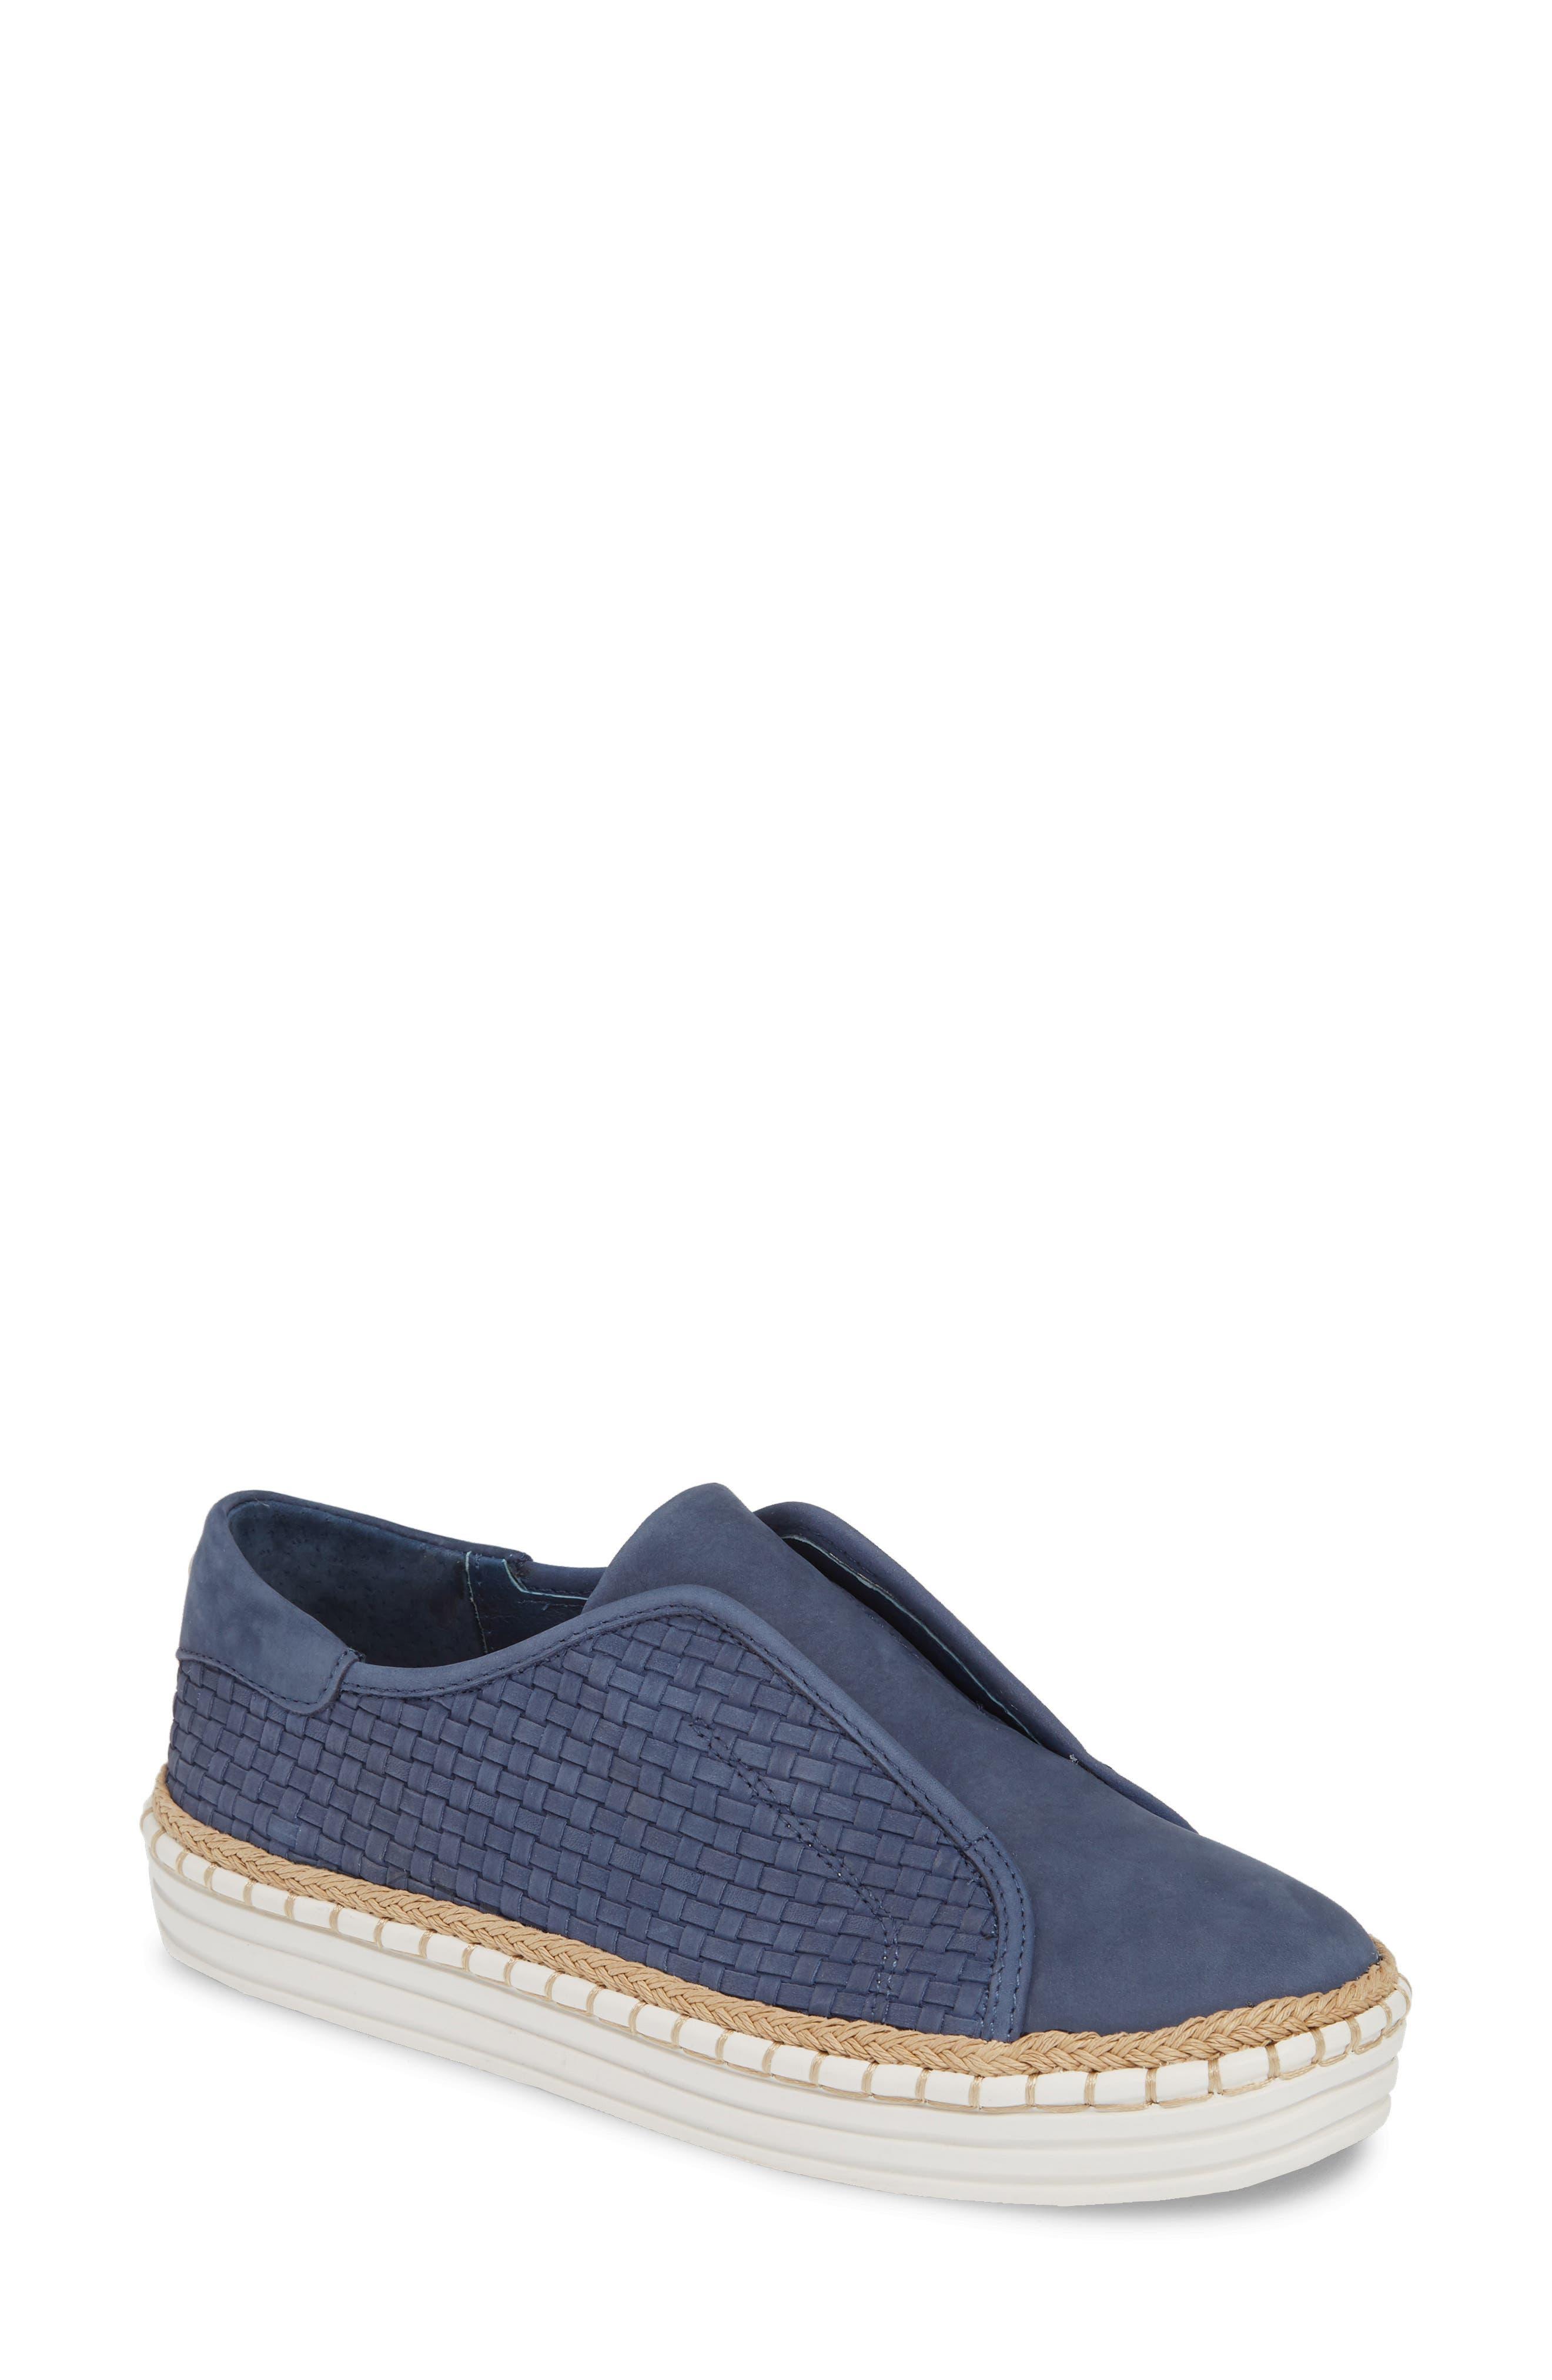 Jslides Kayla Slip-On Sneaker, Blue